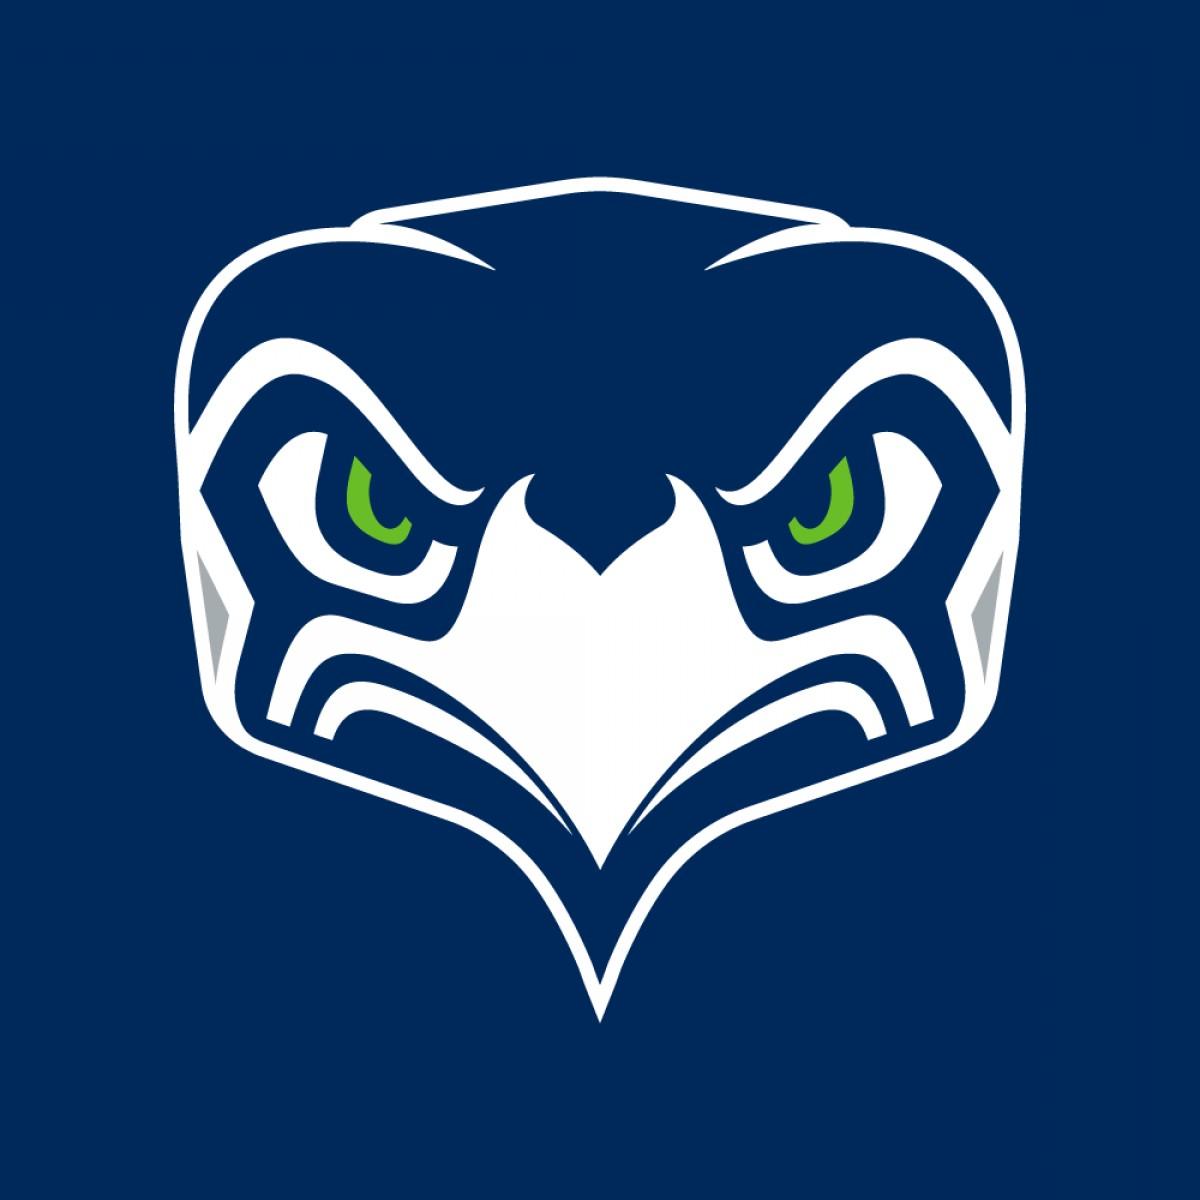 New Seattle Seahawks Alternate Logo.